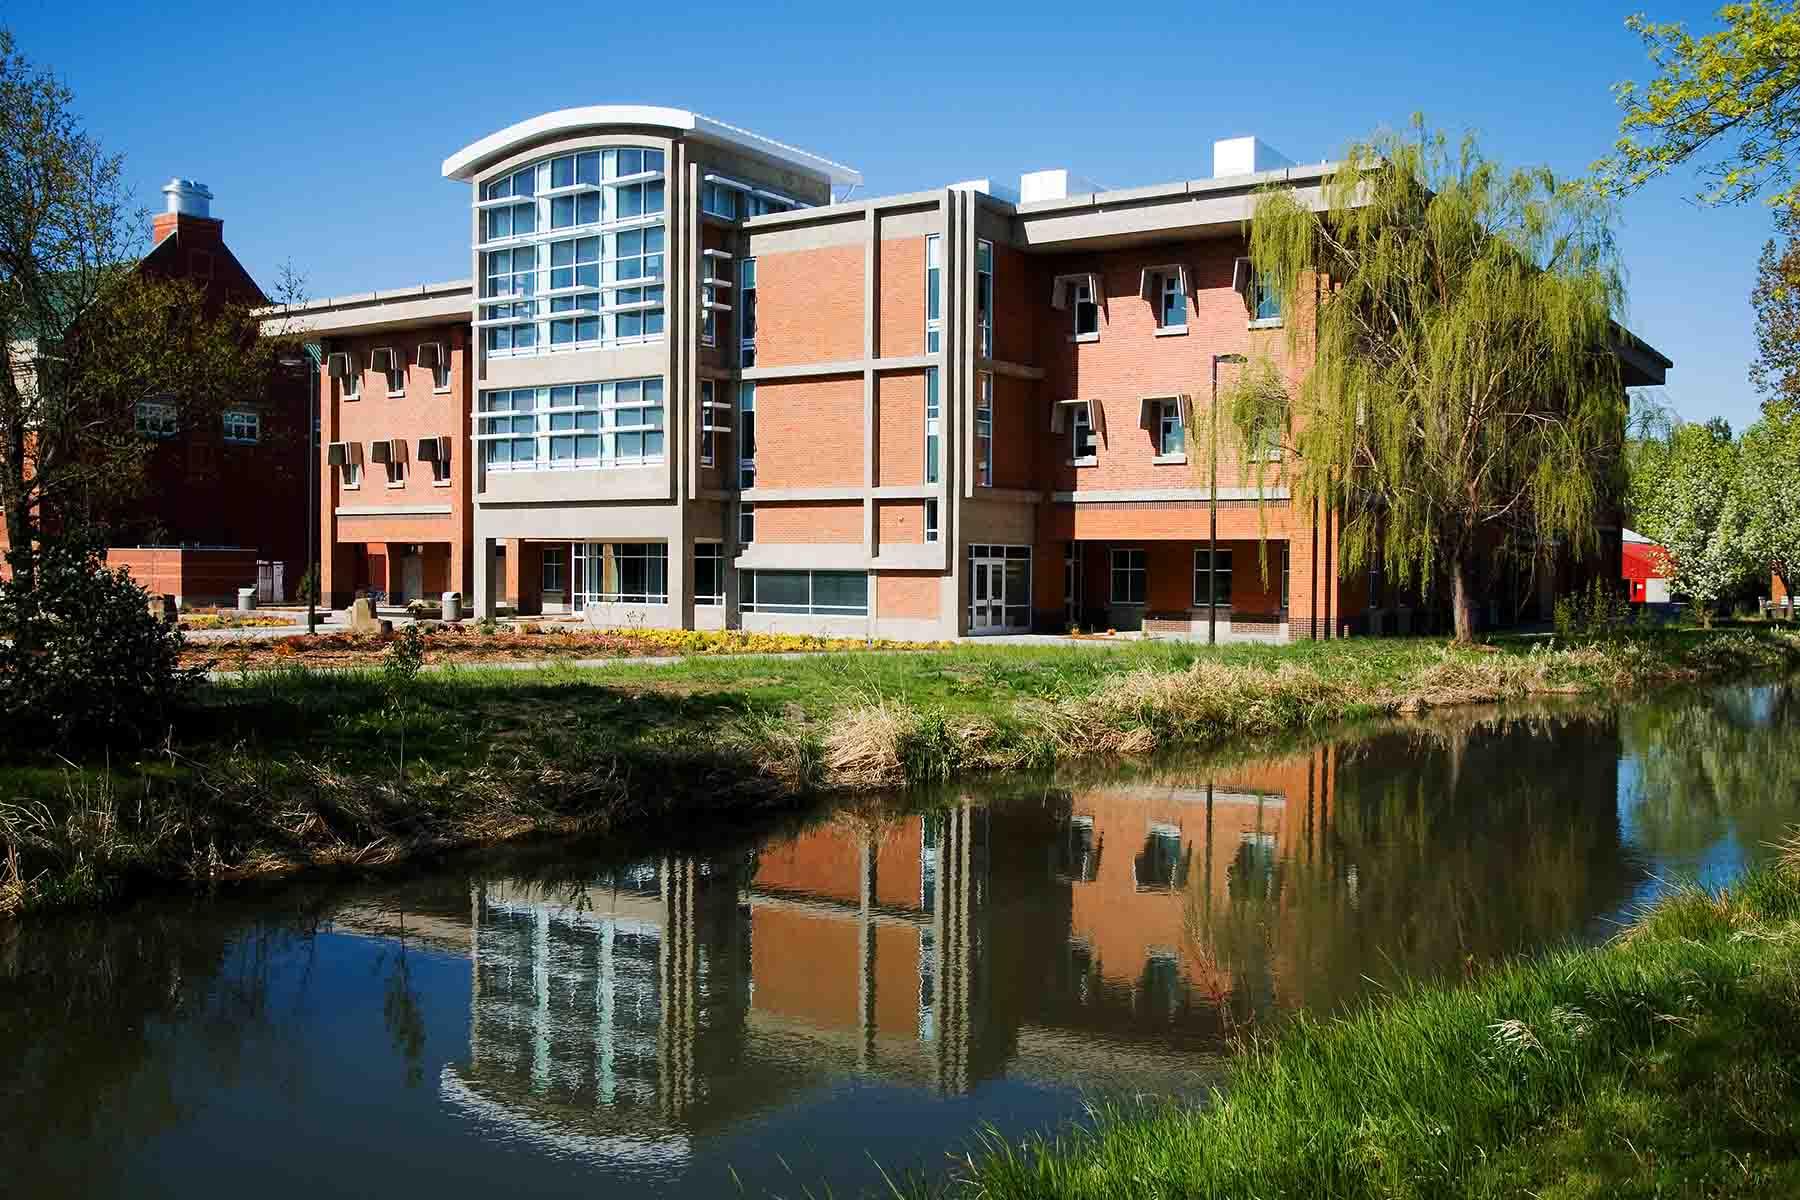 Central Washington University <br/> Dean Hall Laboratory + Classroom Facility <br/> Addition + Renovation